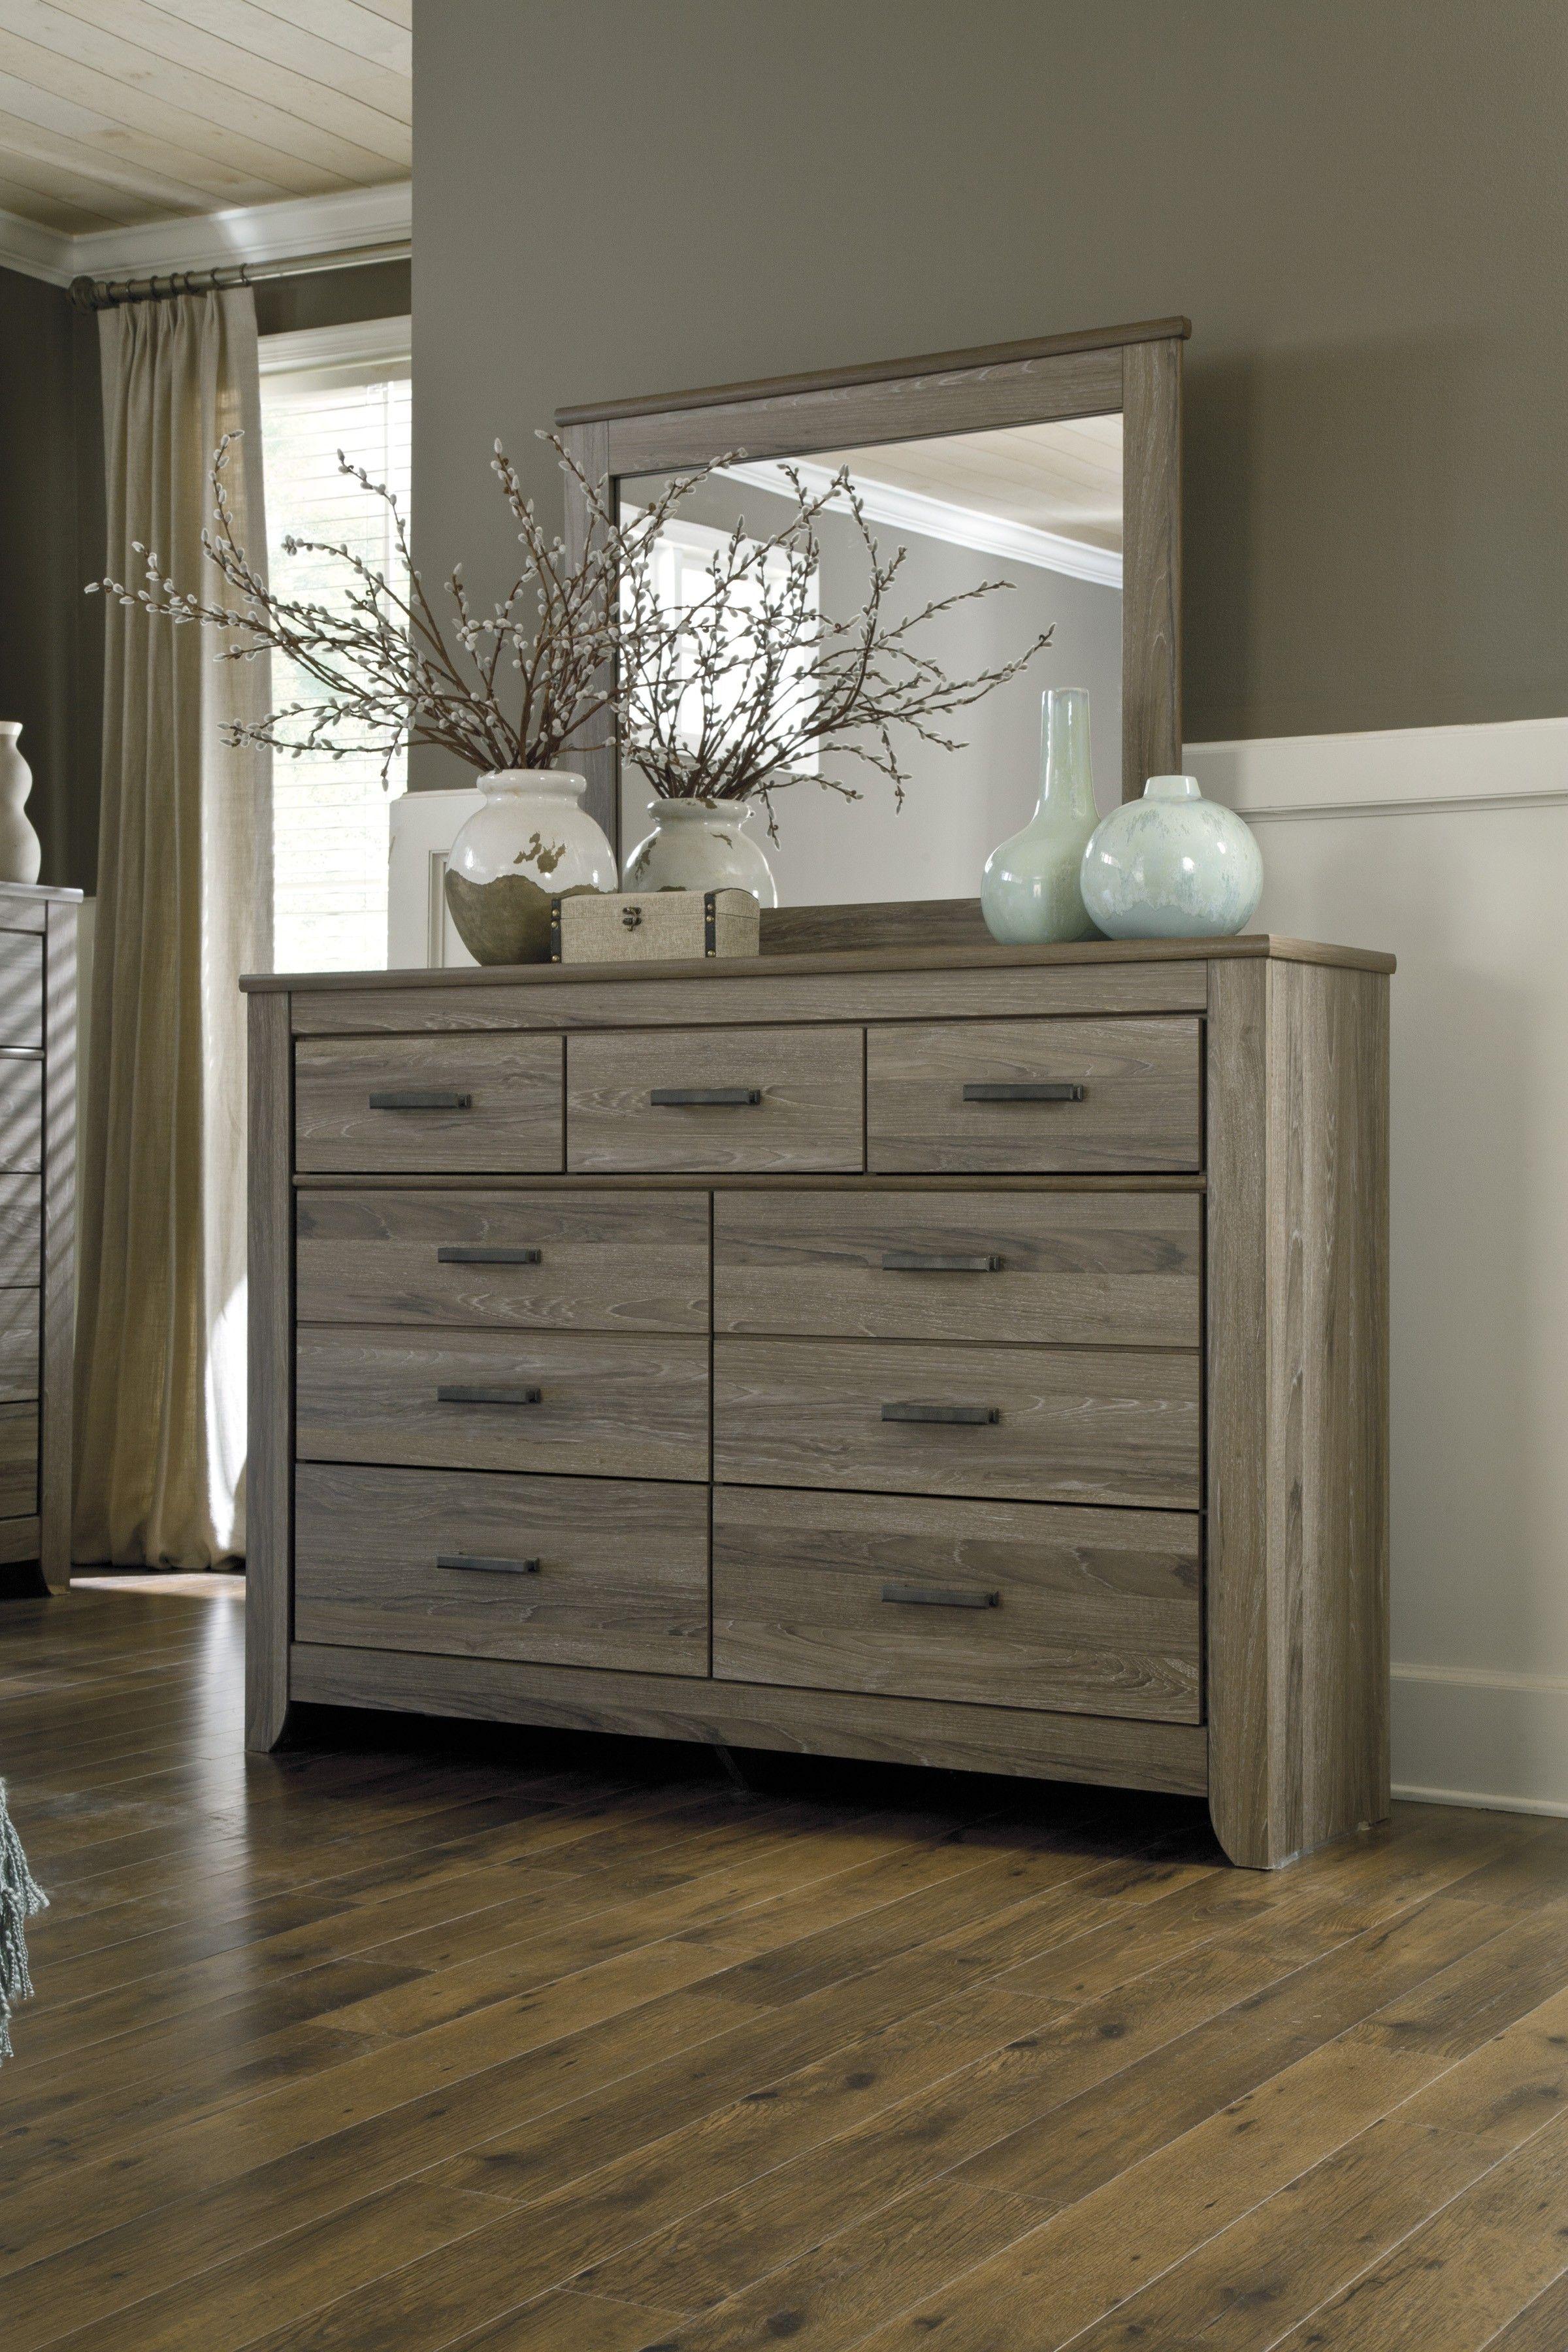 Furniture Signature Design by Ashley Signature Design B248 31 Dressers. Furniture Signature Design by Ashley Signature Design B248 31